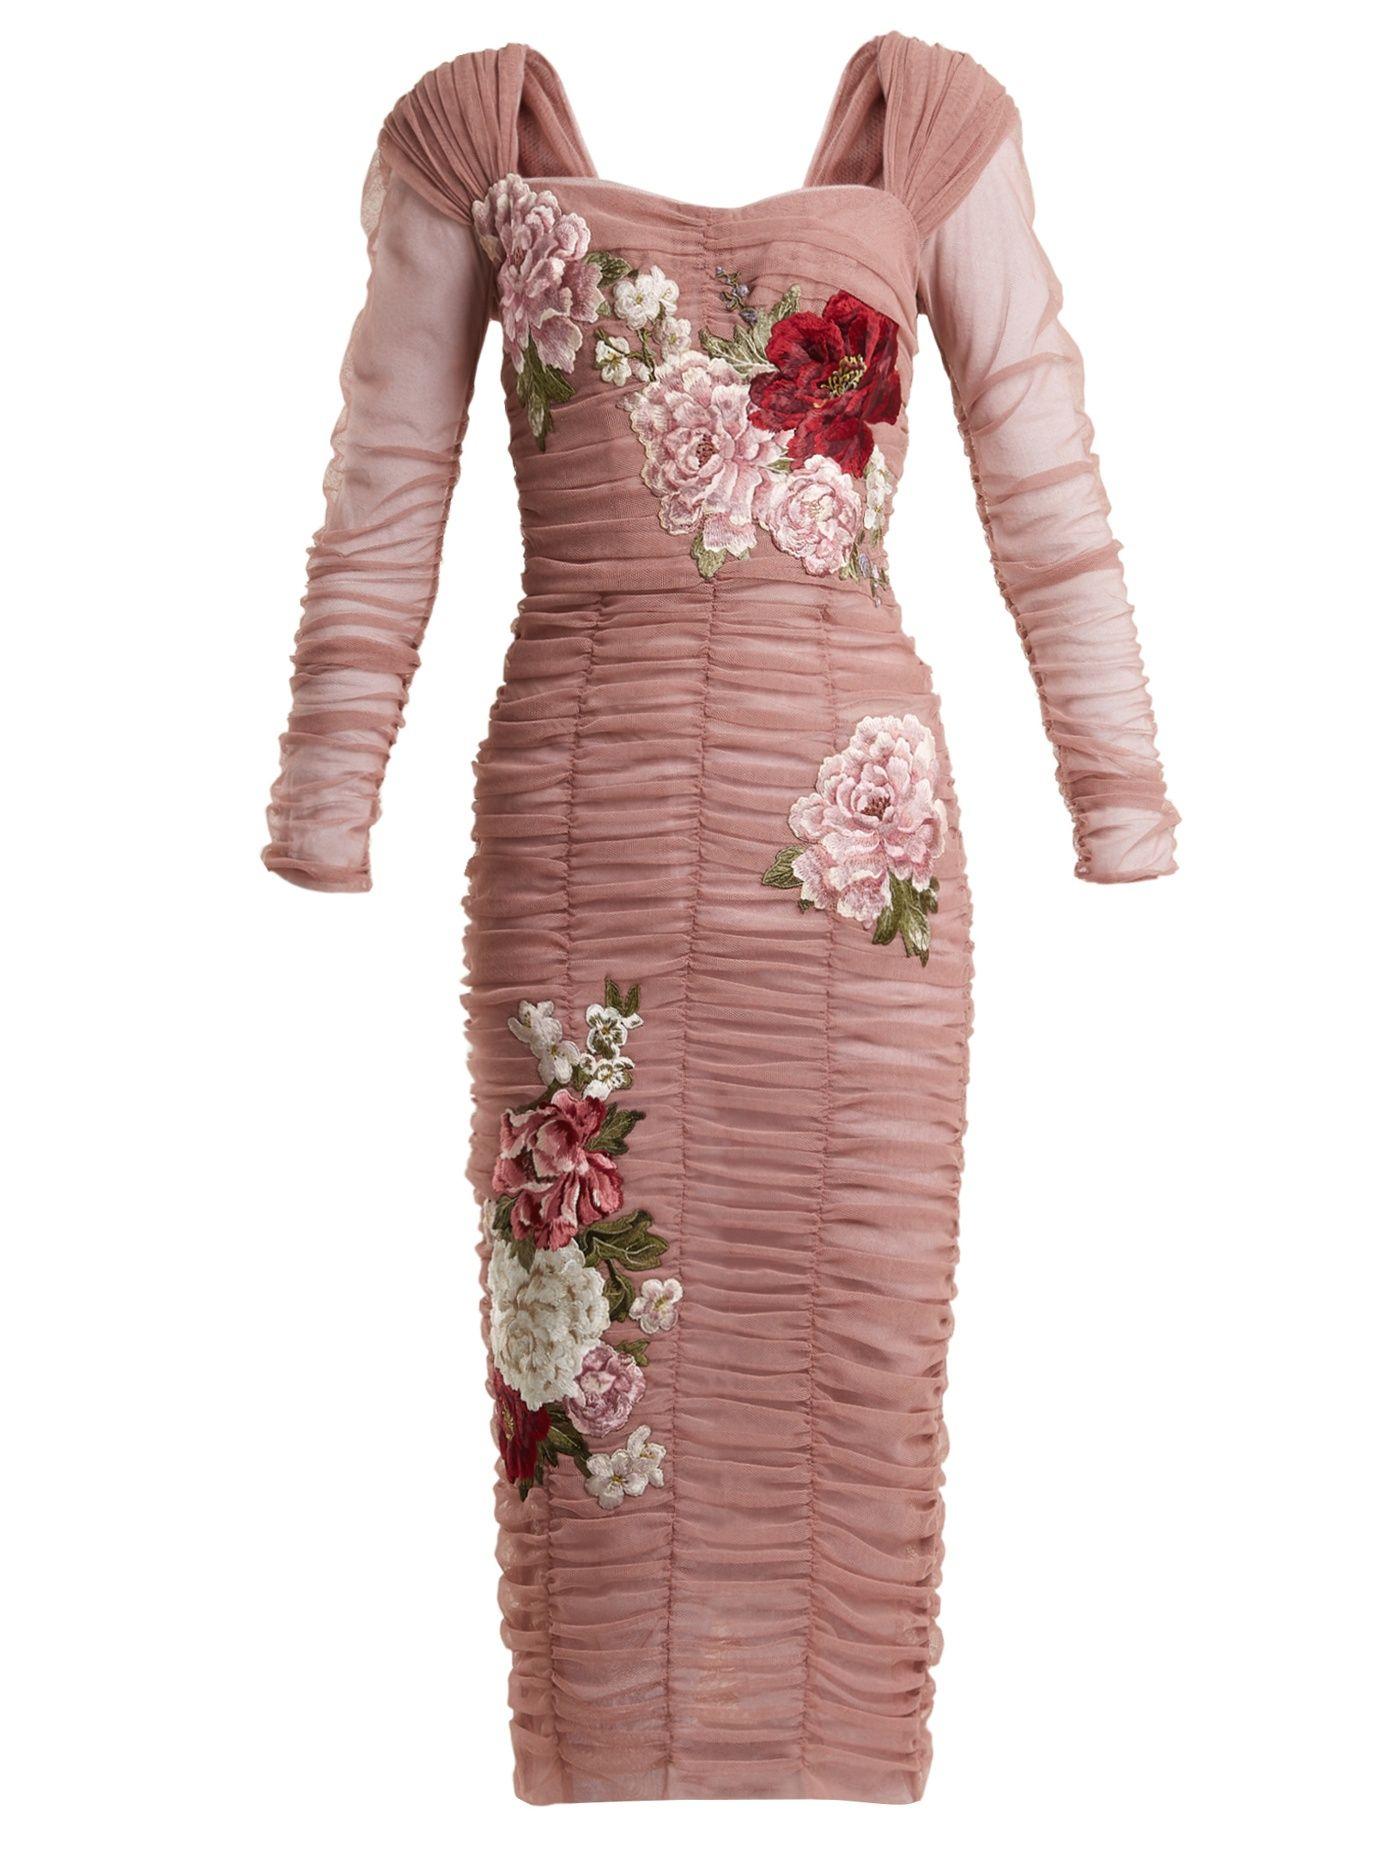 9757e2e8 25 Dresses to Wear to a Valentine's Day Wedding. DOLCE & GABBANA . # dolcegabbana #cloth #